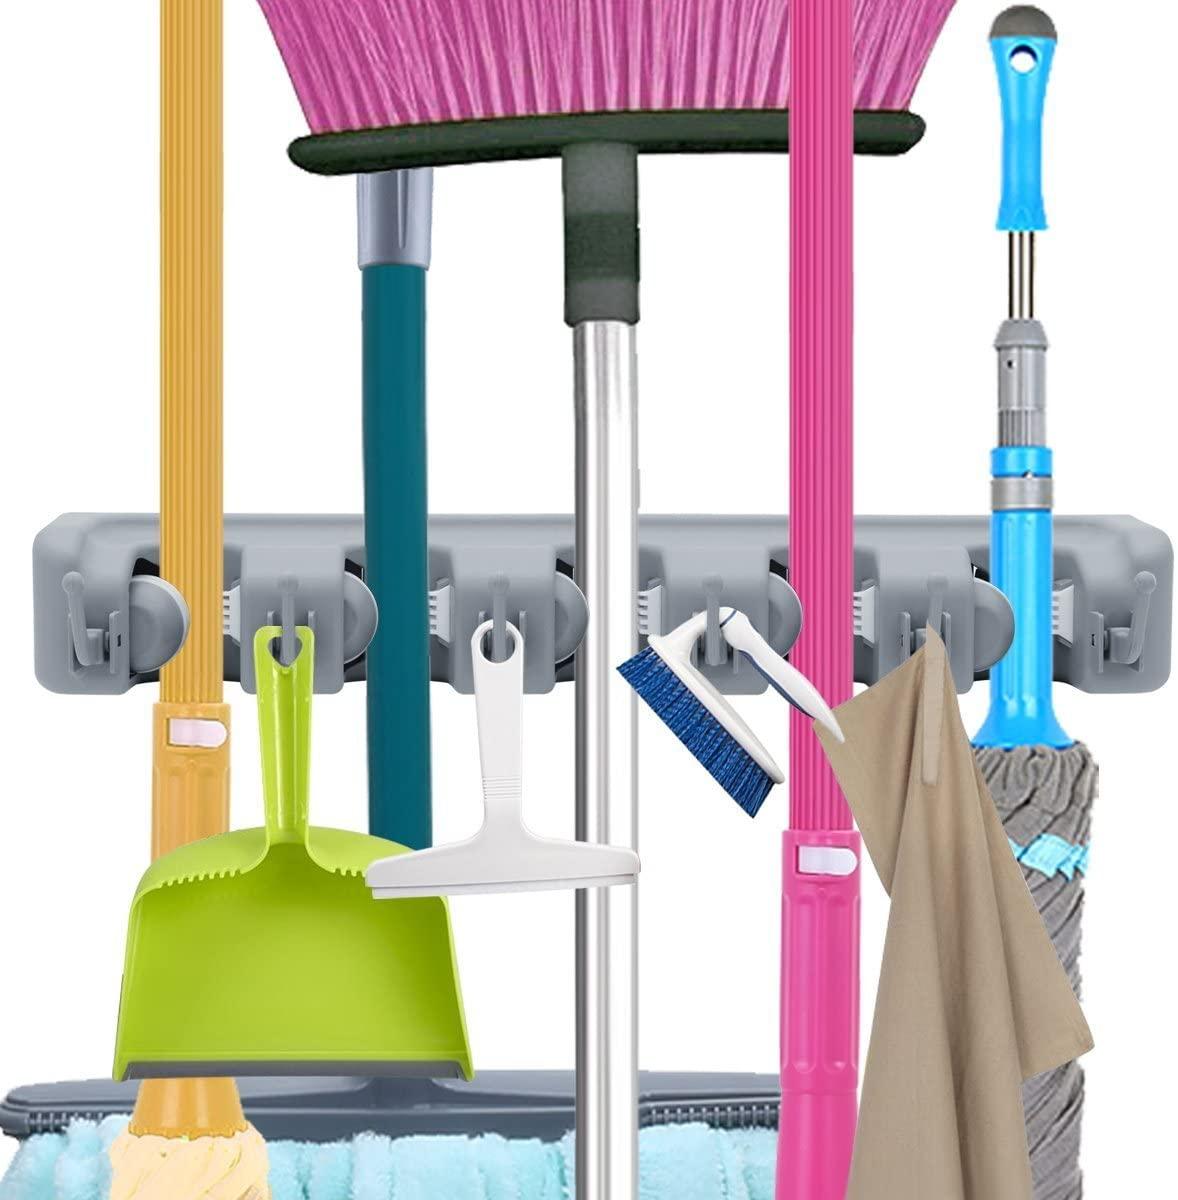 Wall Mounted Multi-Functional Broom Holder Tool Magic Plastic Mop Holder Bathroom Kitchen Storage 3 Styles